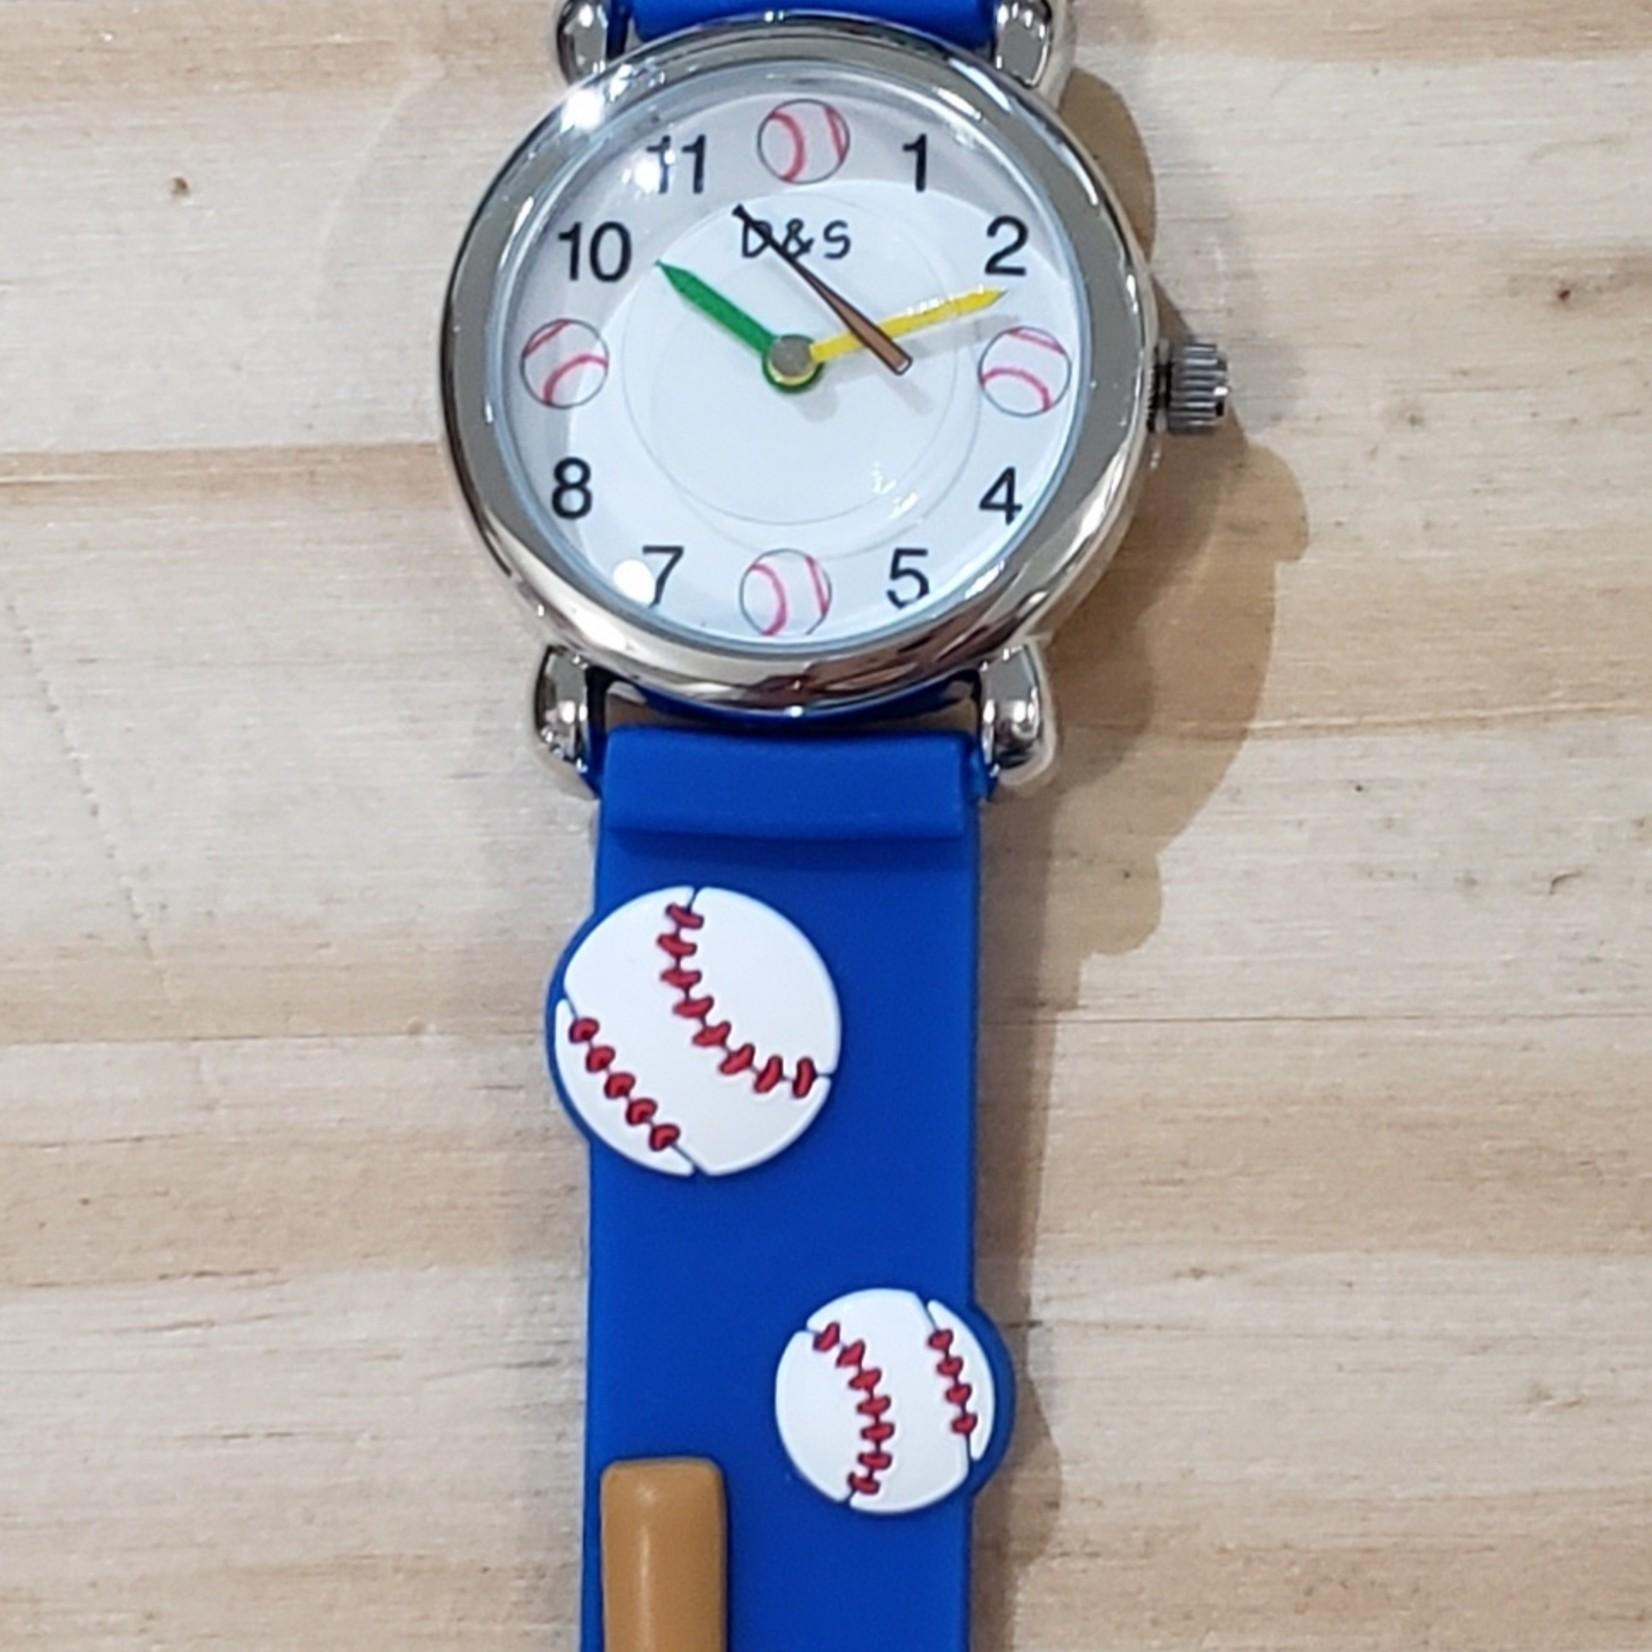 D&S Imports Watch - Baseball, Blue